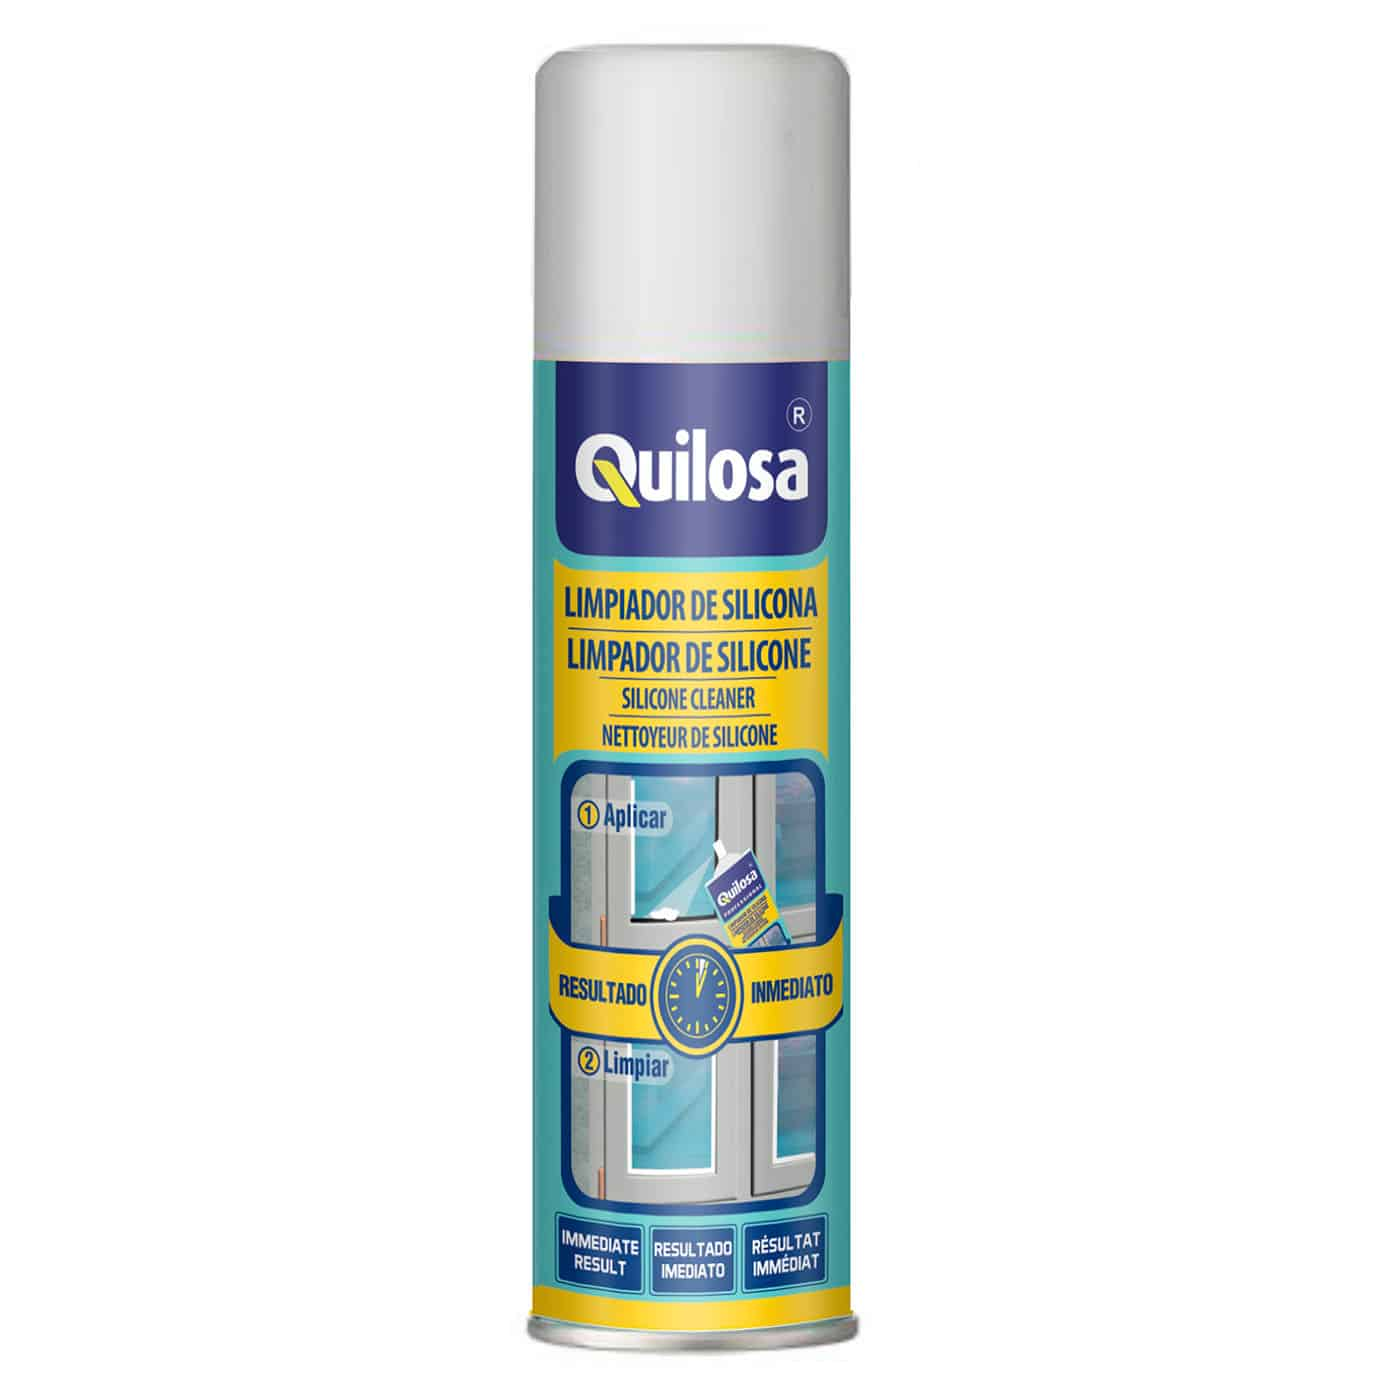 Silicone Acrylique Pour Salle De Bain nettoyeur de silicone - quilosa